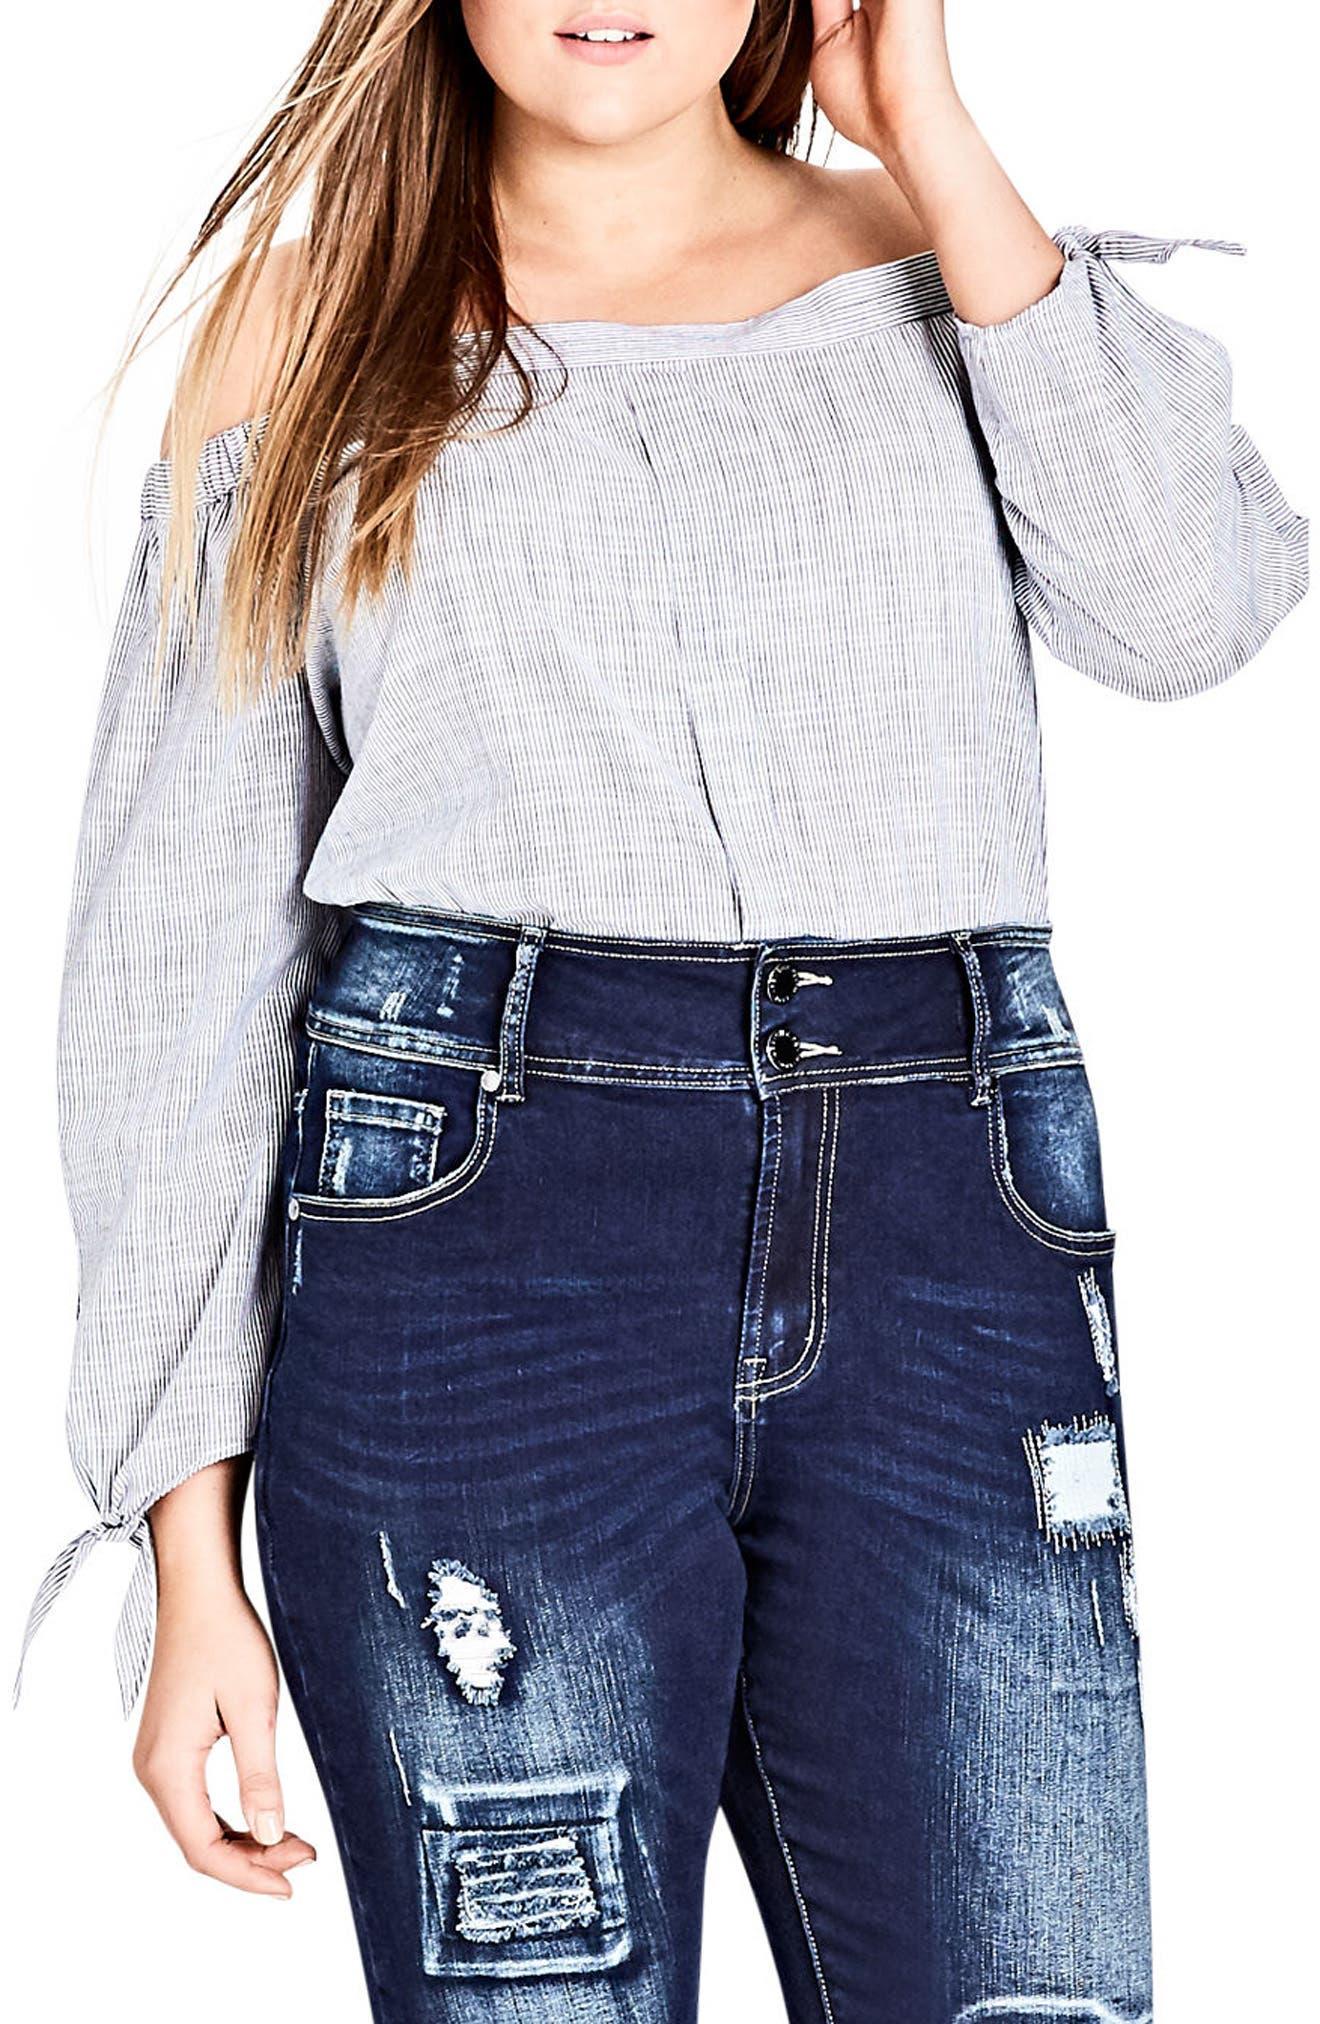 Harley Patched Skinny Jeans,                             Main thumbnail 1, color,                             Dark Indigo